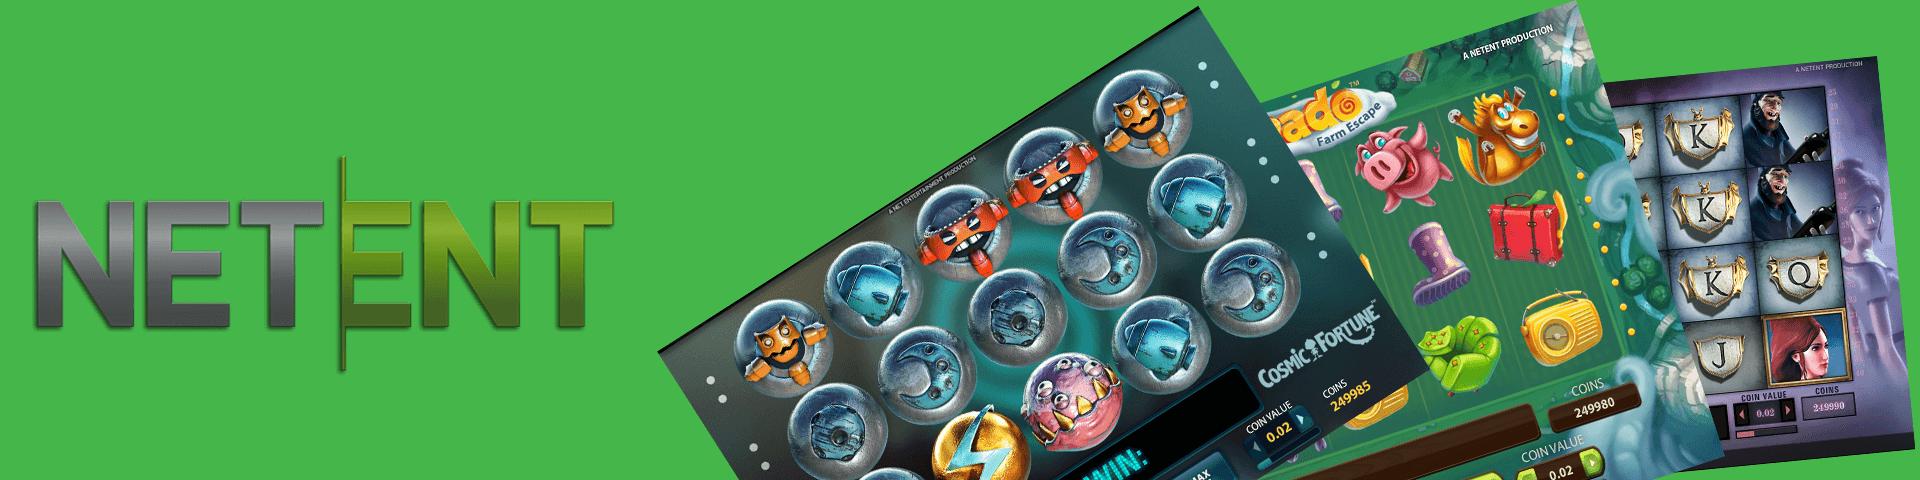 jocuri-casino-NetEnt-multabafta-slider